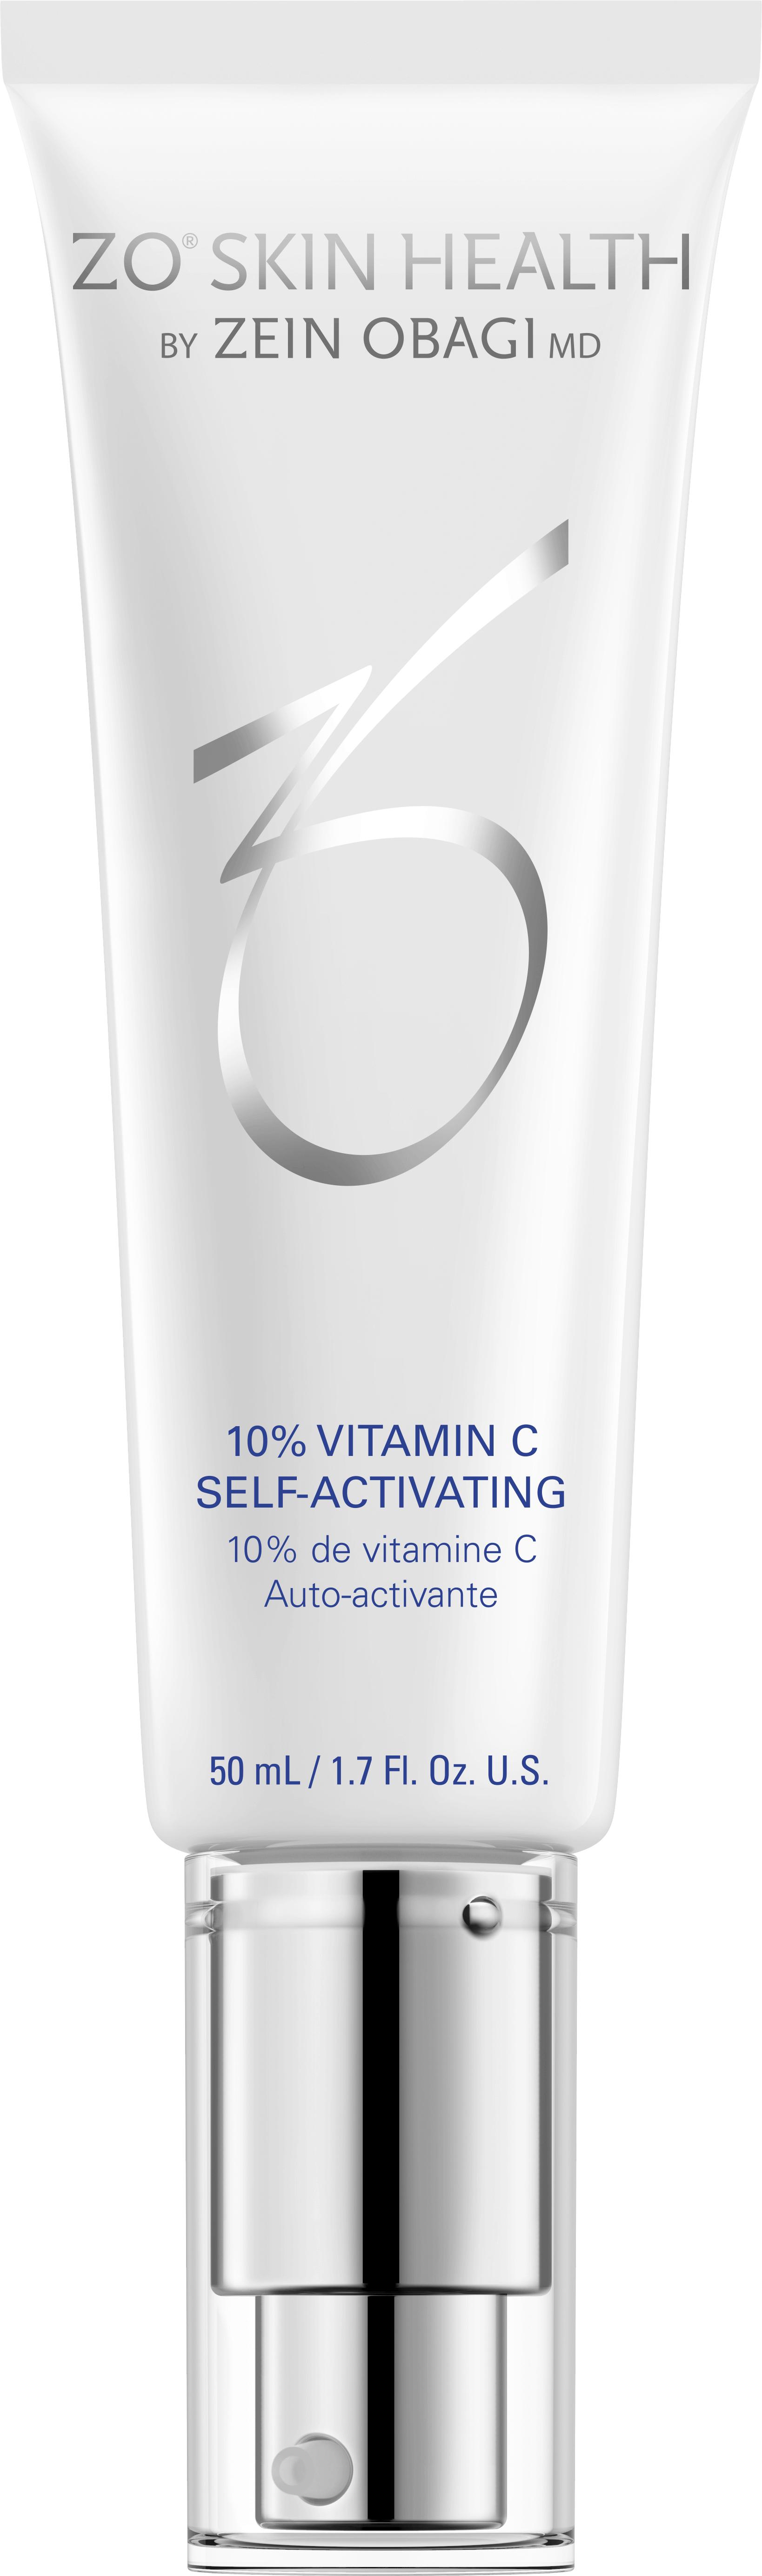 Zo Skin Health - Vitimin C